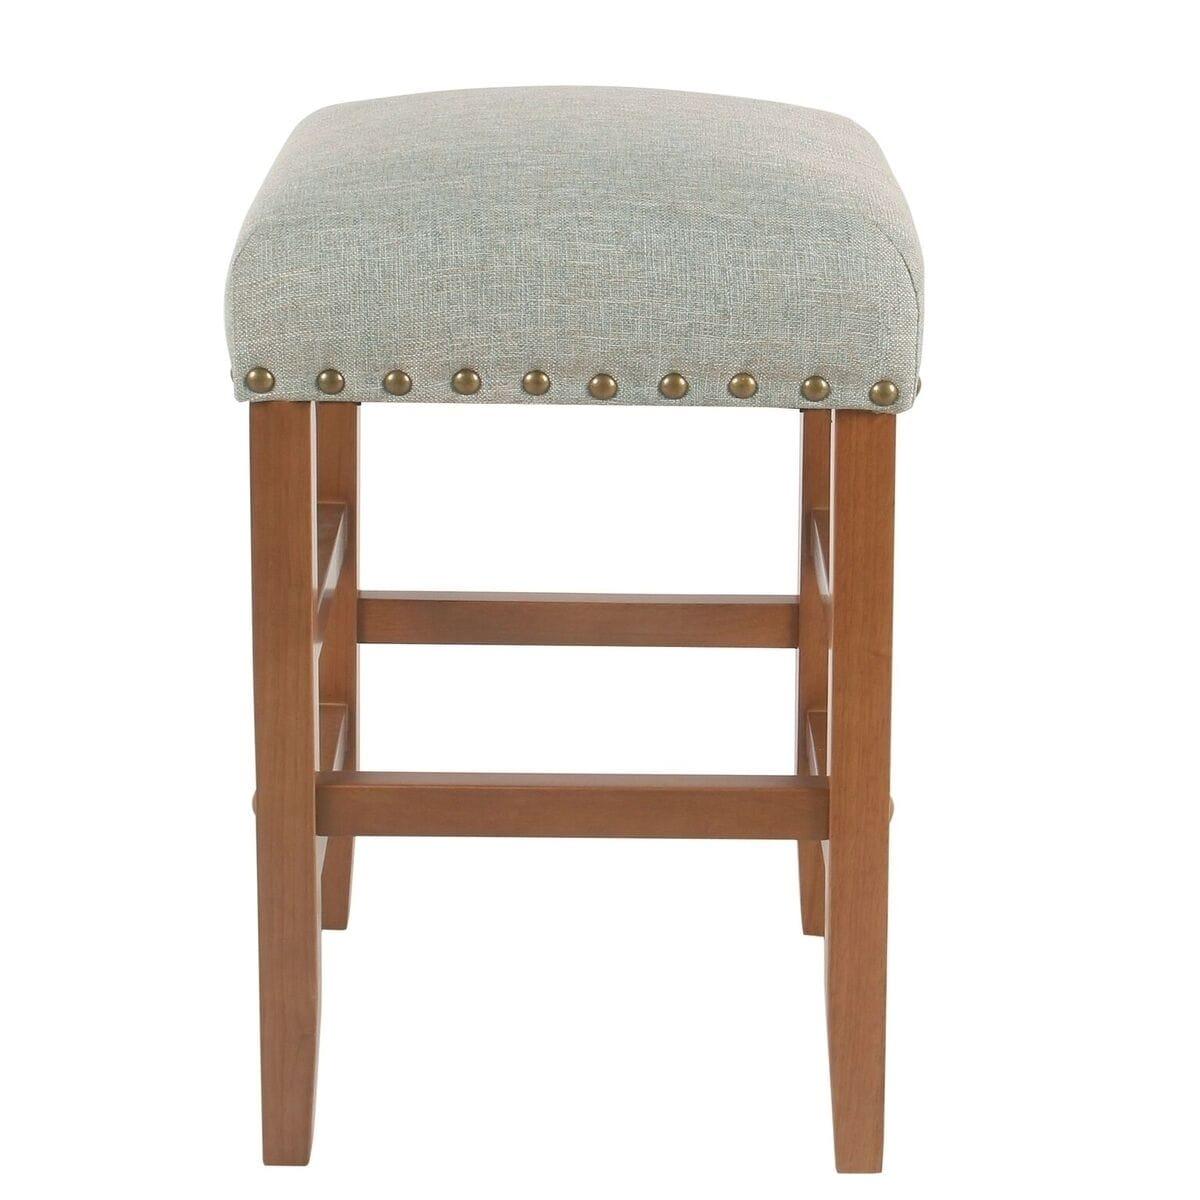 Fantastic Homepop Blake 24 Backless Counter Stool With Nailheads Vapor Teal Short Links Chair Design For Home Short Linksinfo